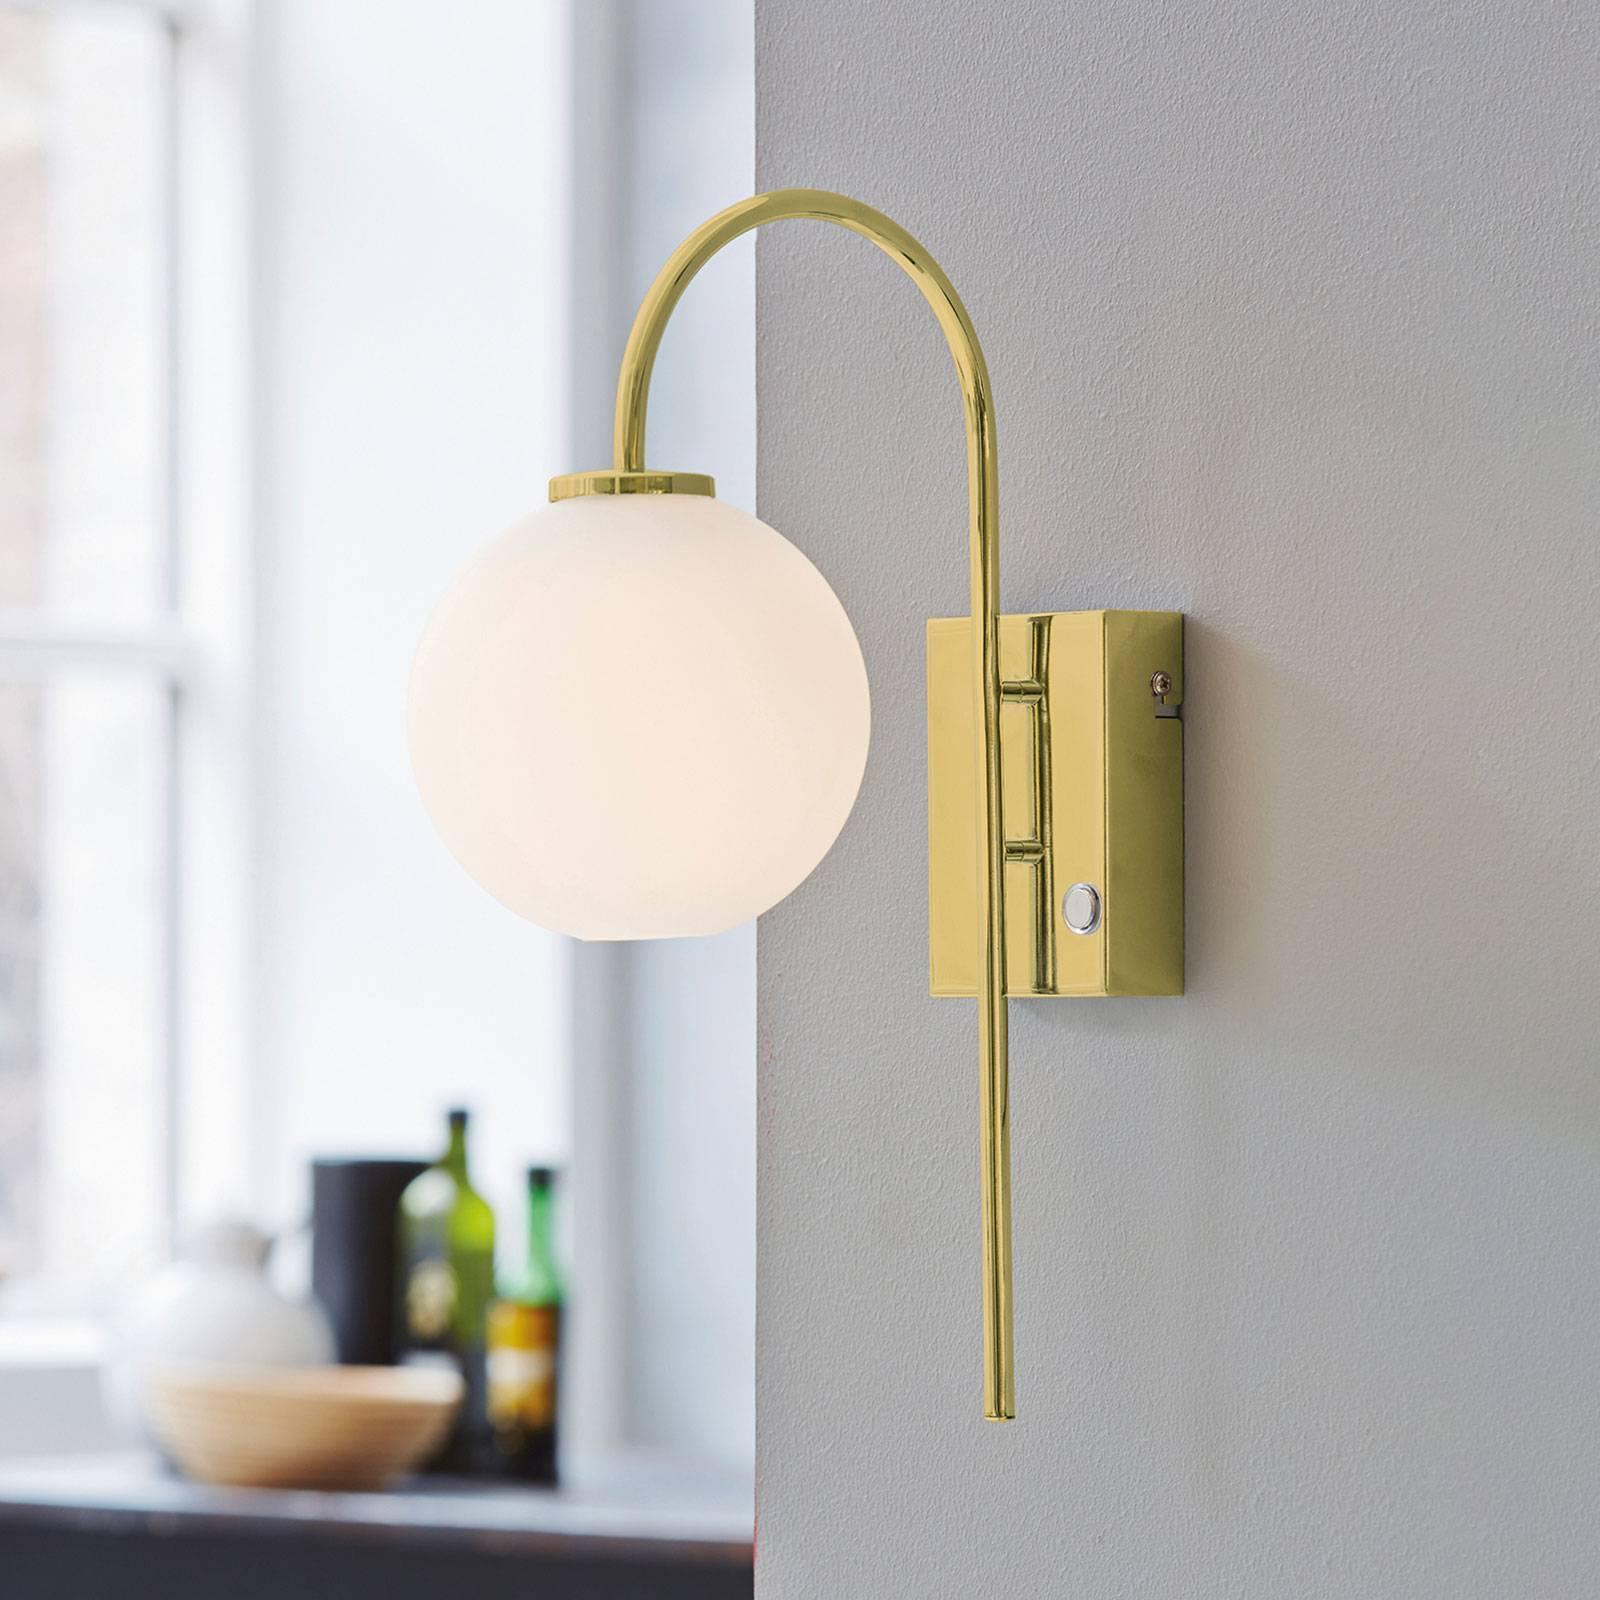 Wandlamp Ballon met stekker, 1-lamp, messing